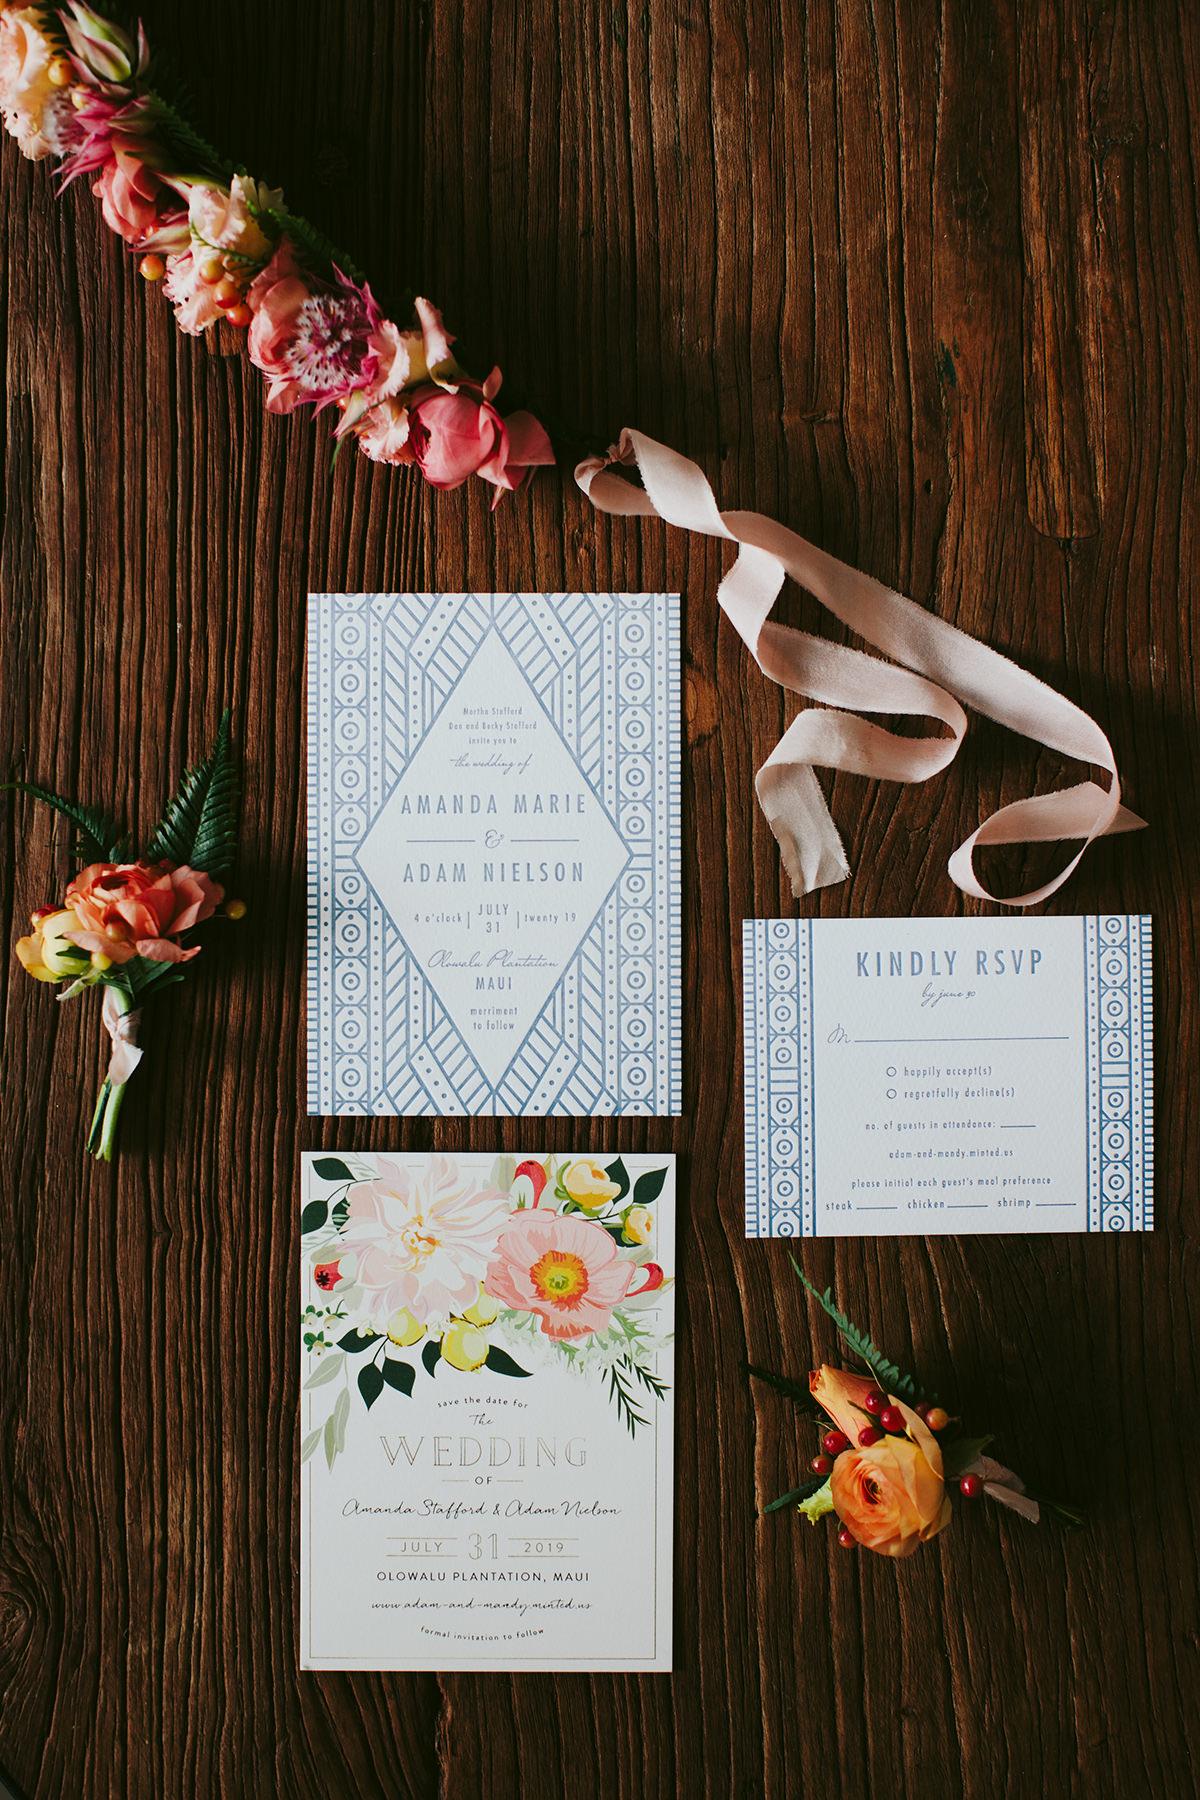 batik stationery for a Maui wedding